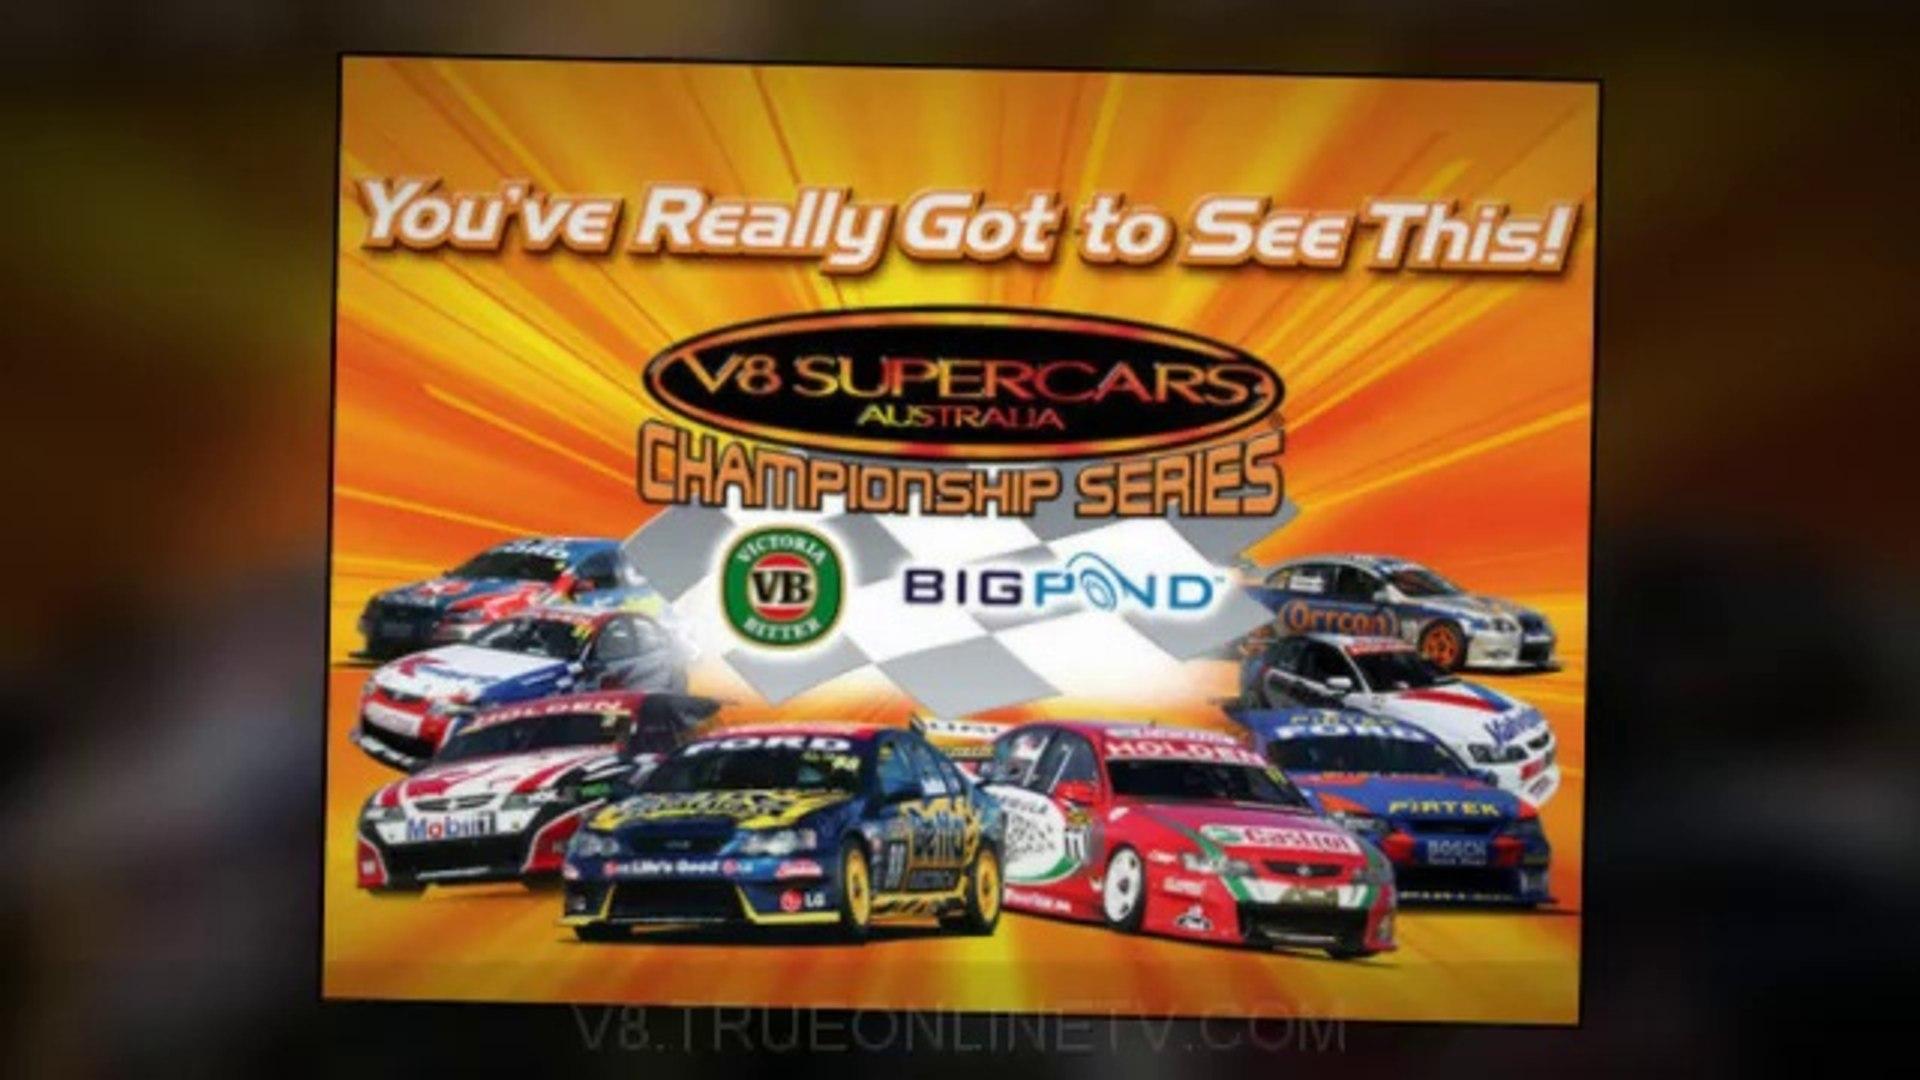 2013 Chill Perth 360 (V8 Supercars) Barbagallo - Race 2 - Touring Car Masters Round 2 [Perth 360]